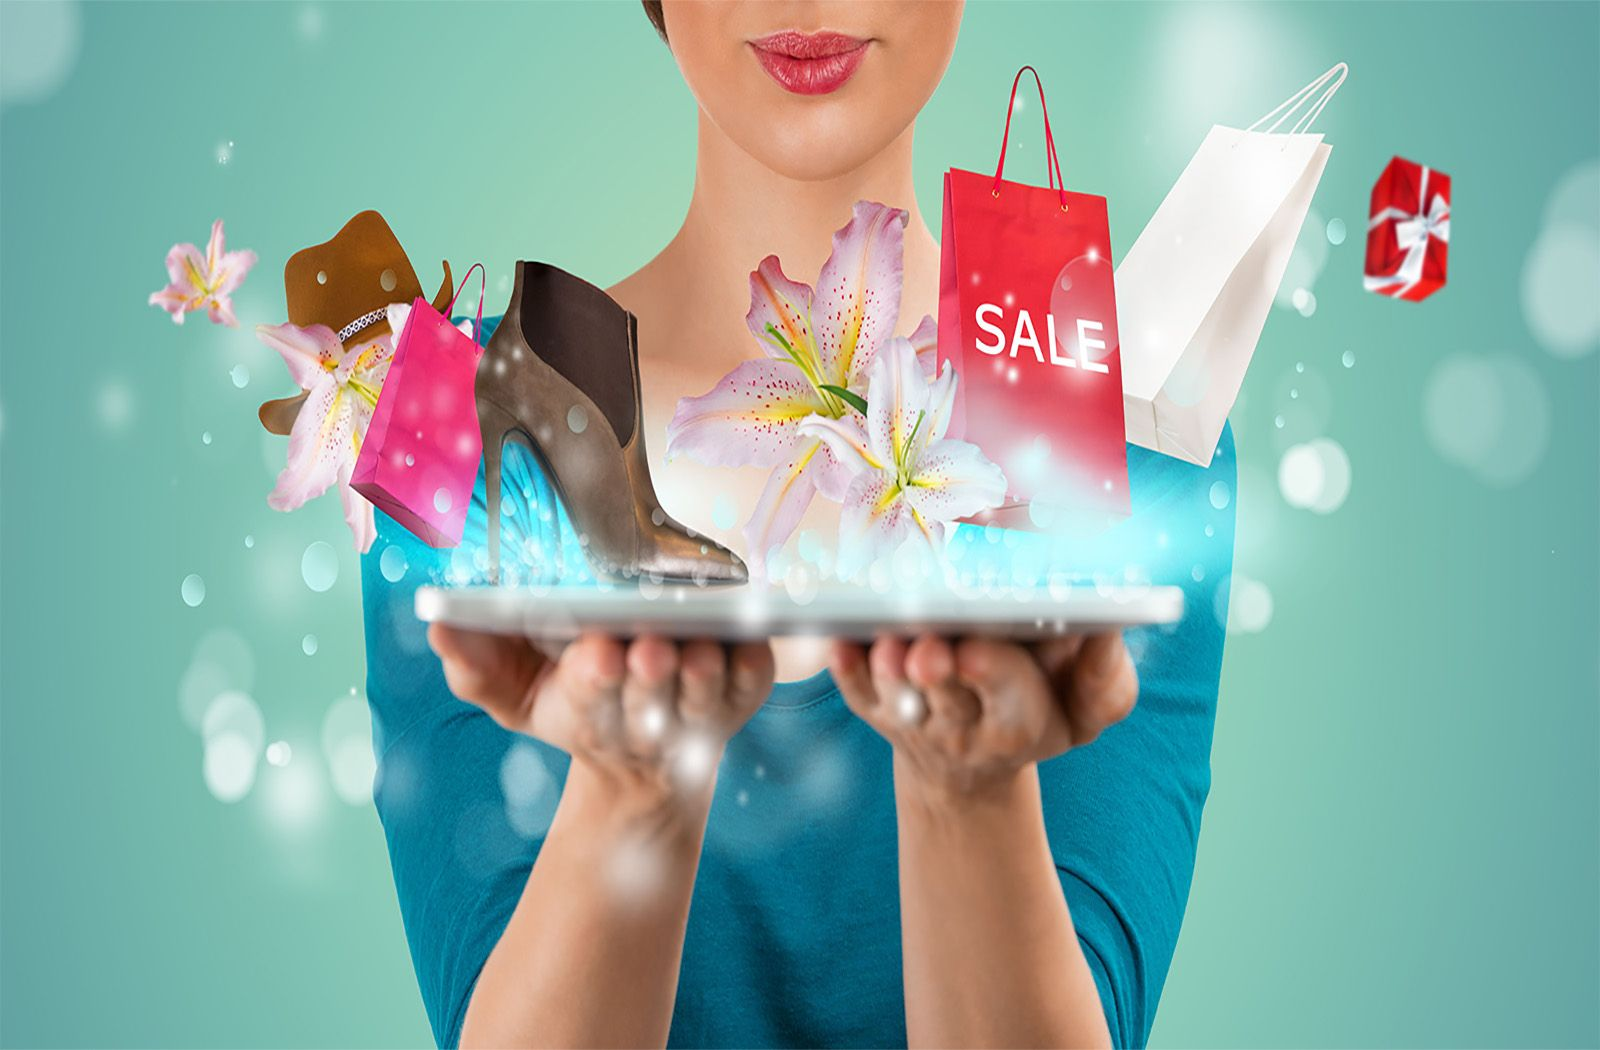 Instagram: An Invaluable e-Commerce Business Tool